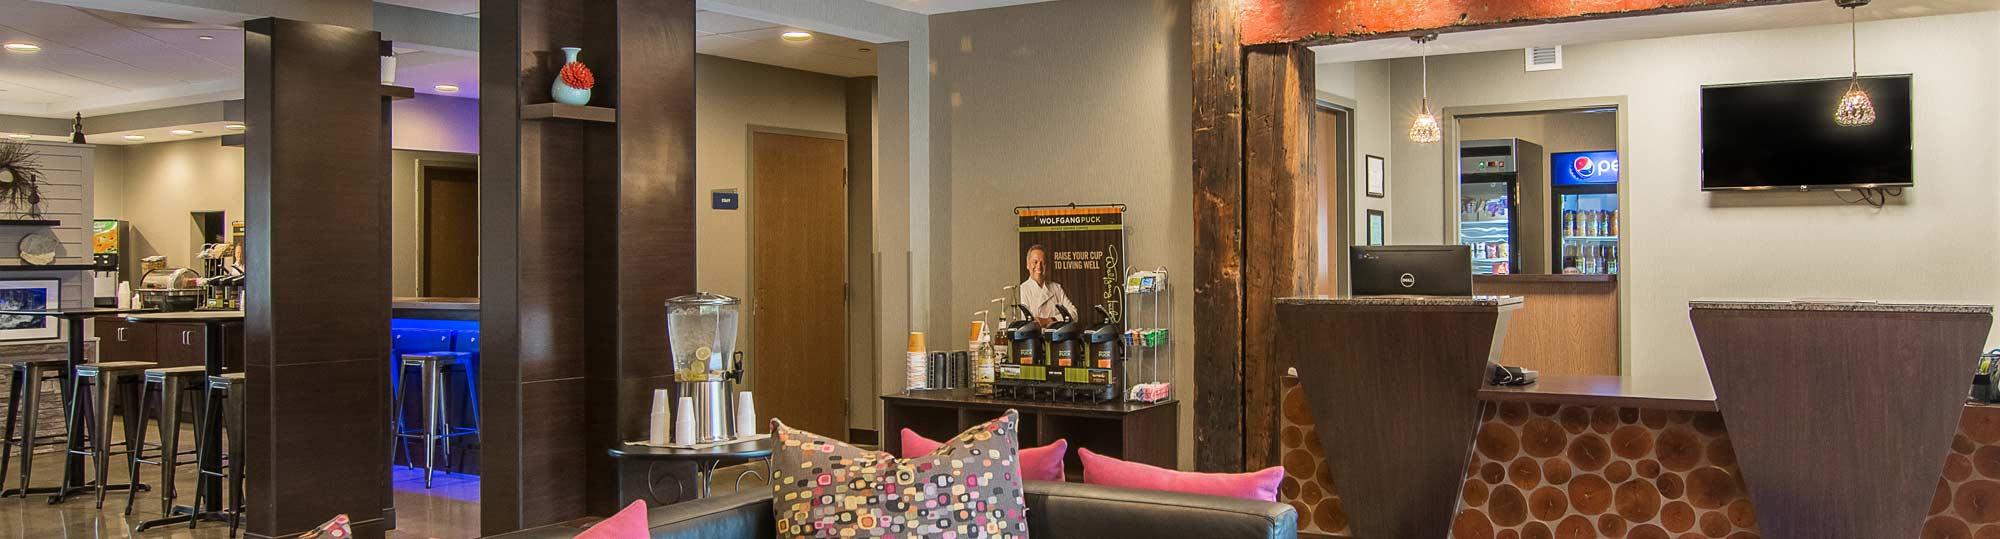 Cobblestone Hotel and Suites Connellsville